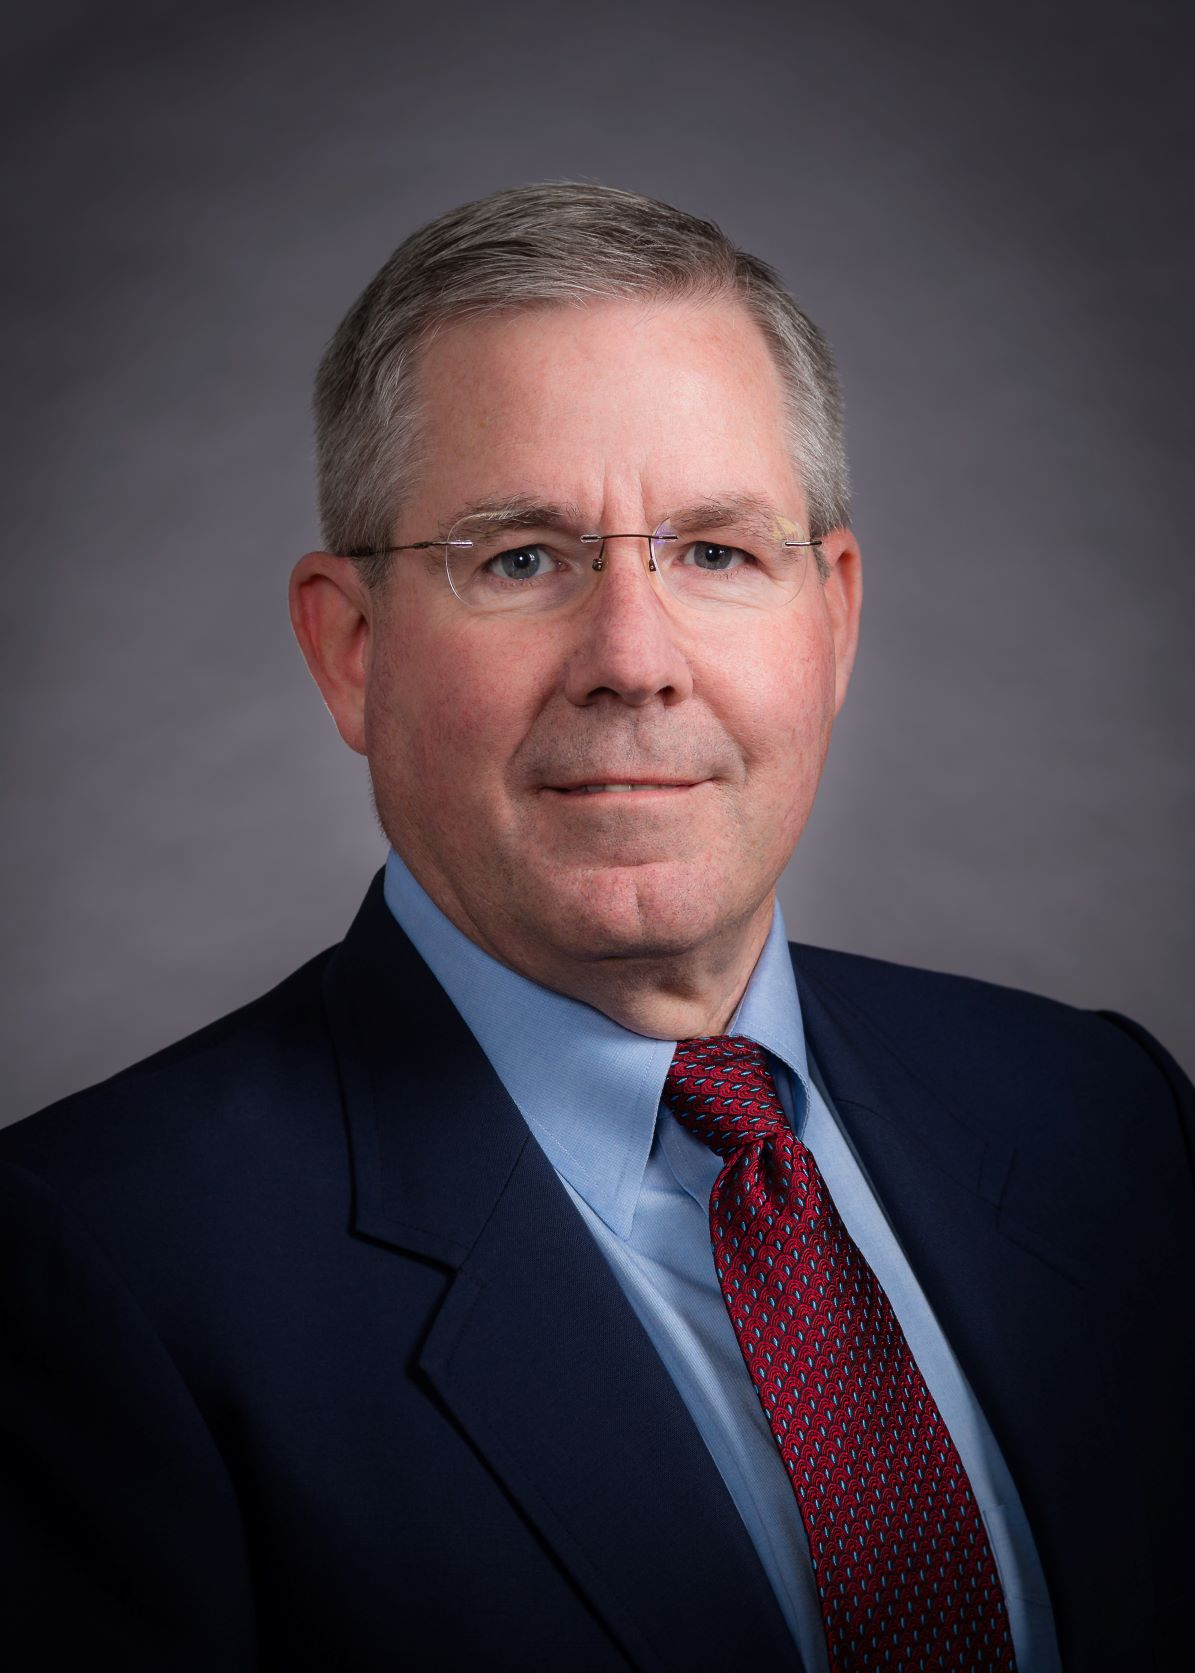 Michael Patterson - Vice President